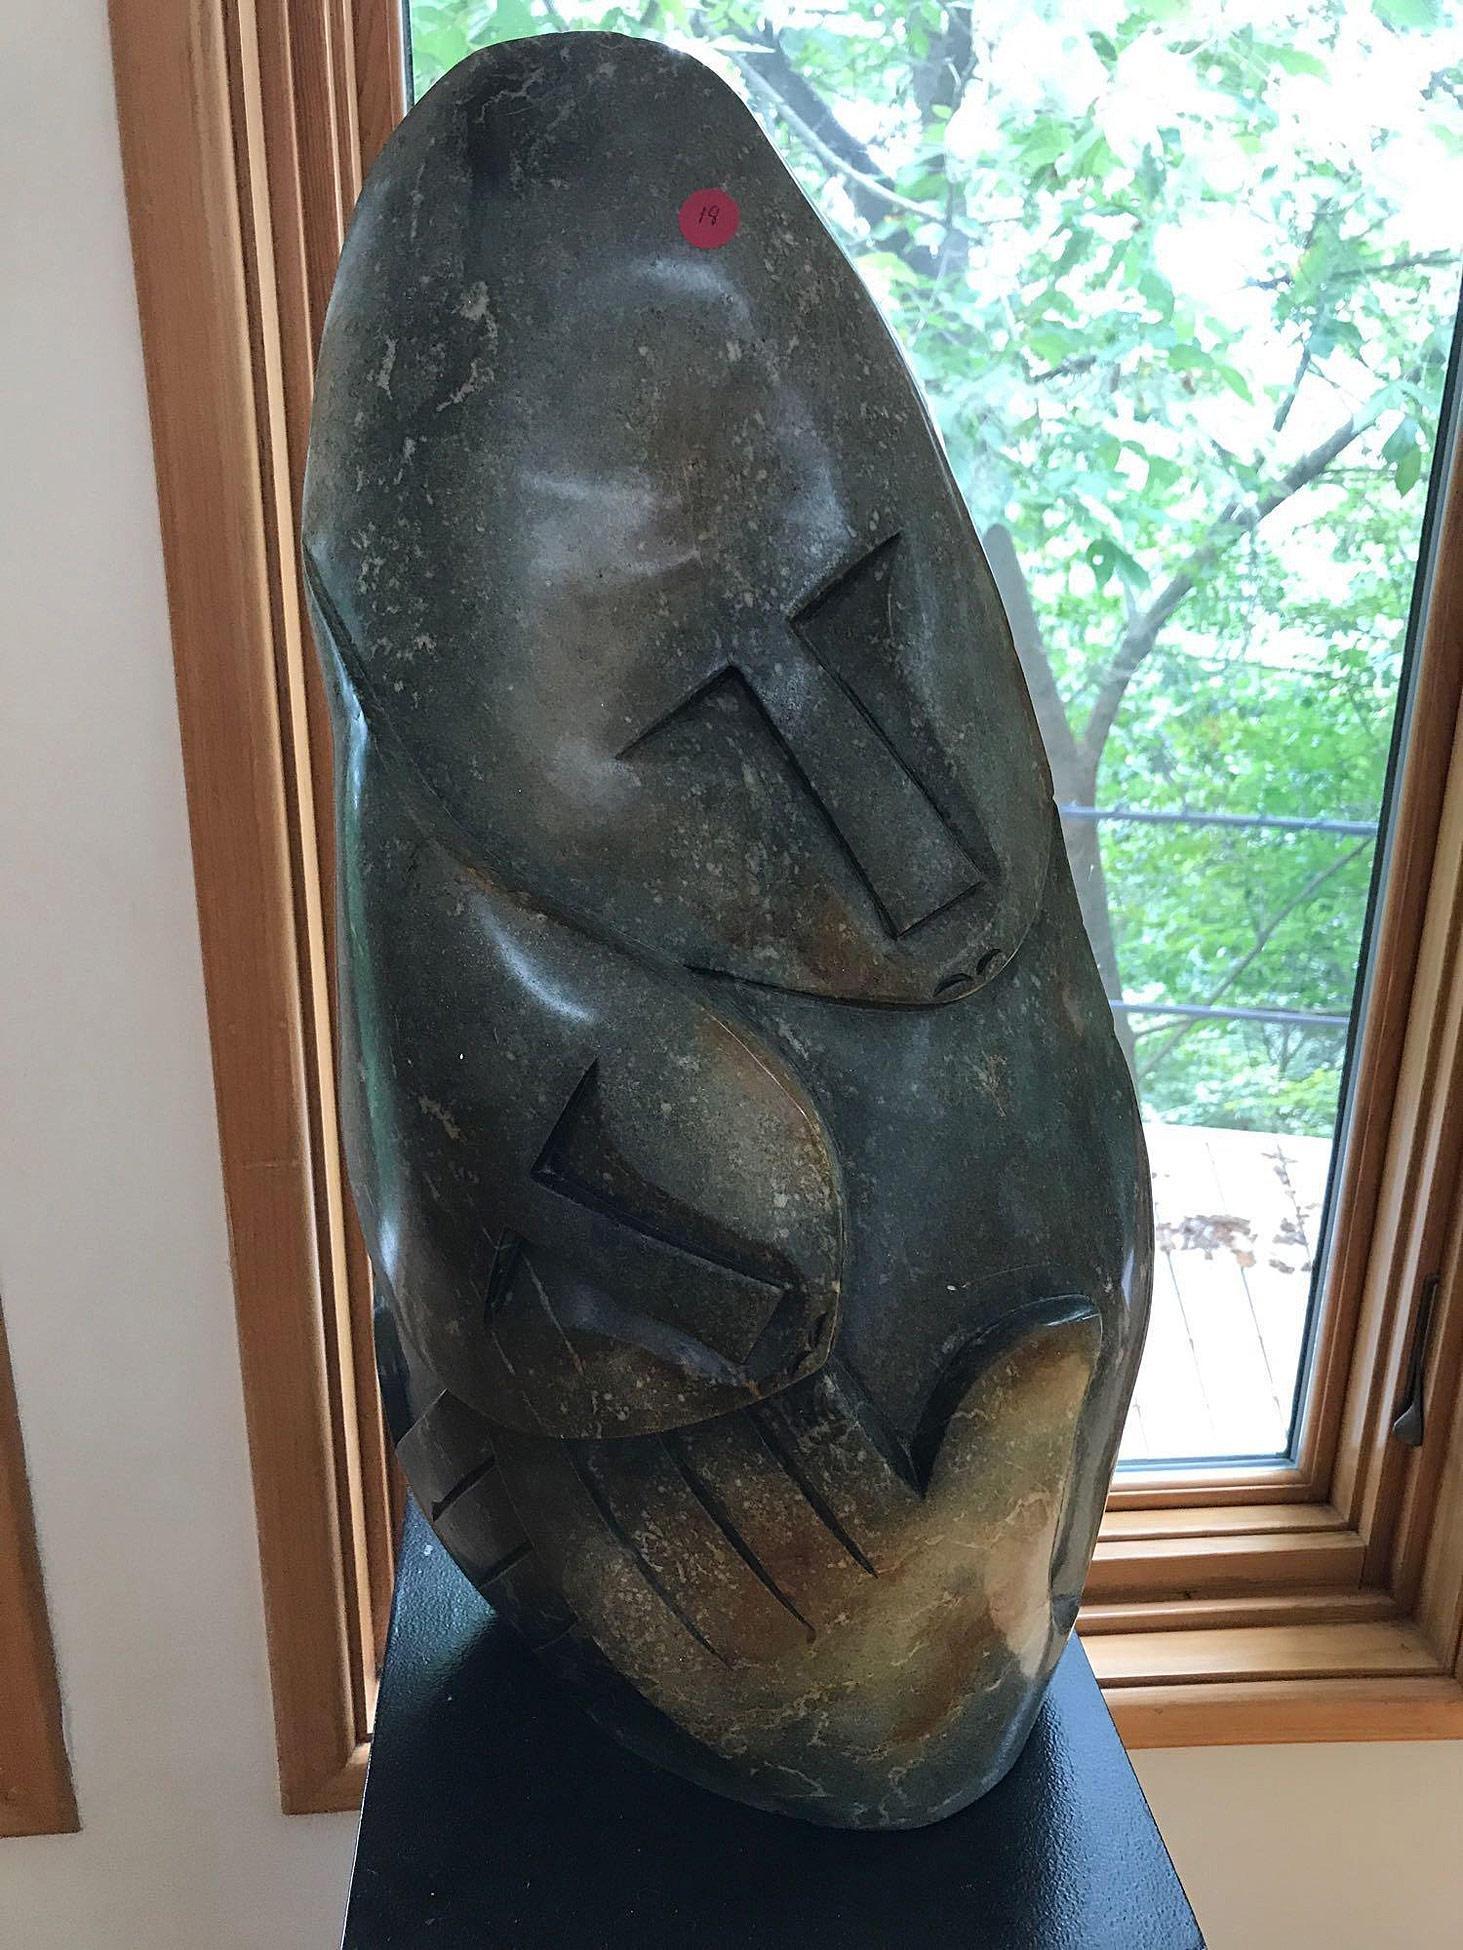 Zachariah Njobo. Shona Stone Sculpture